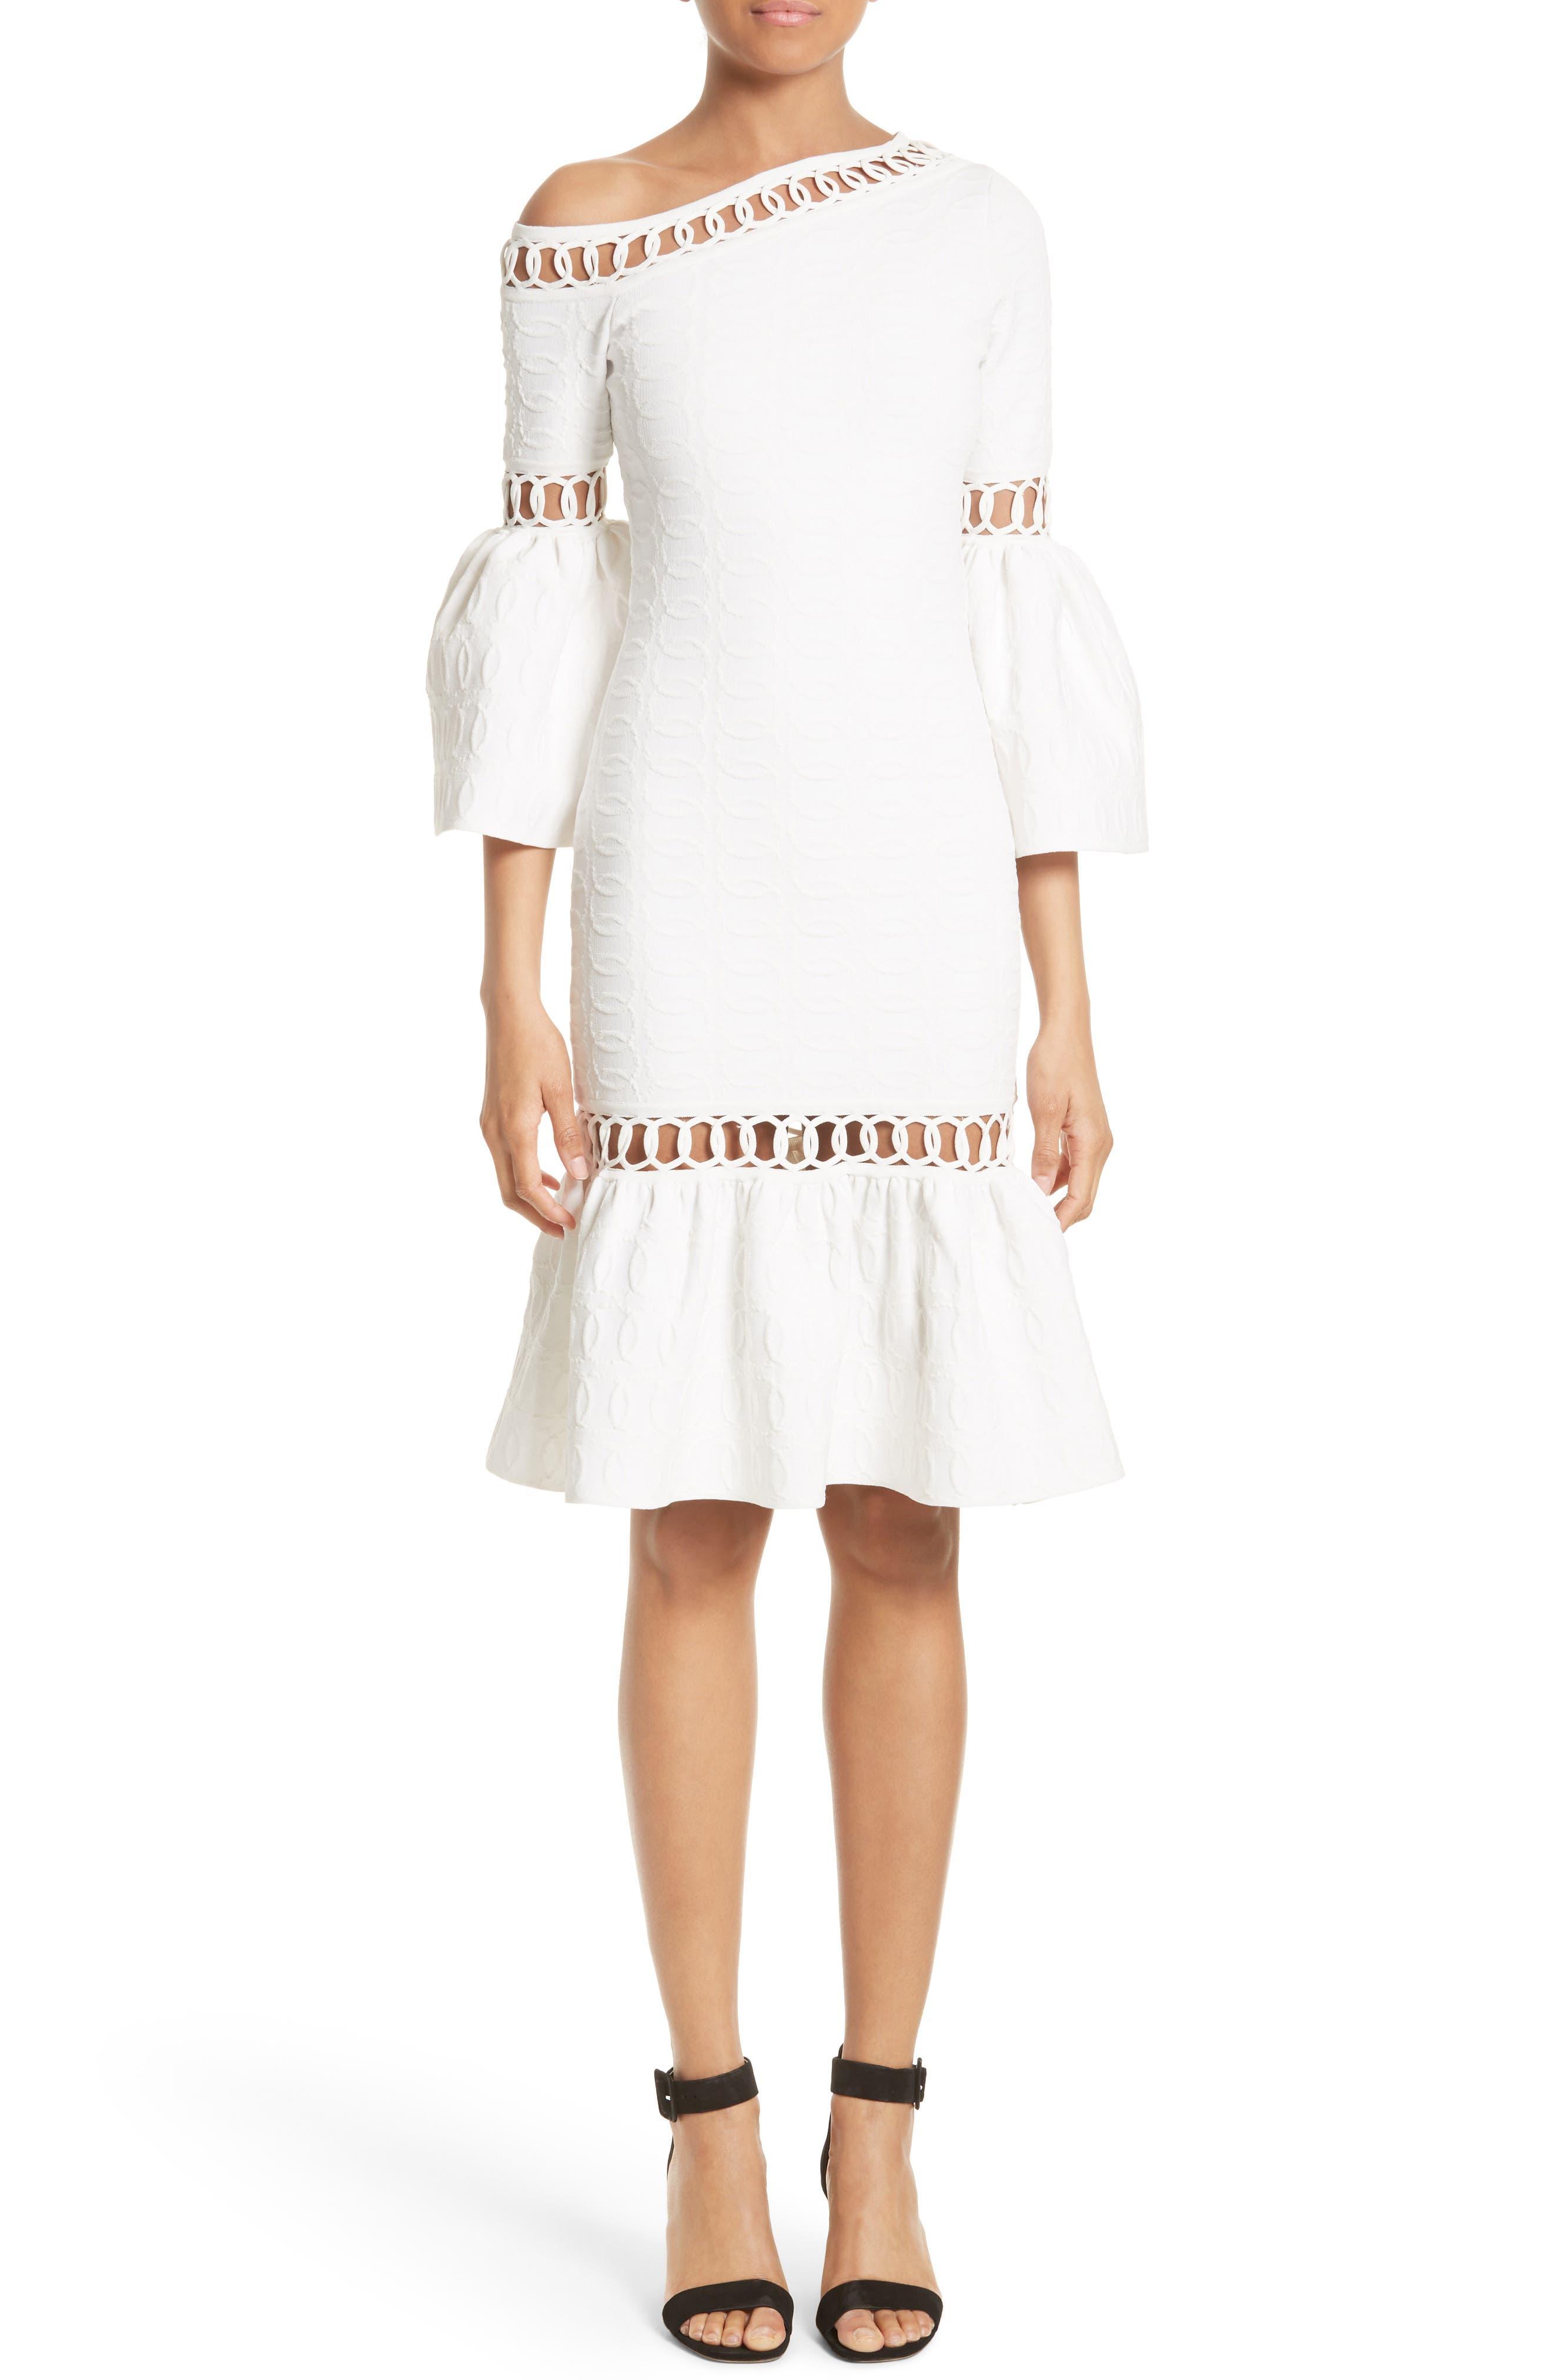 Jonathan Simkhai Chain Link Lace Fit & Flare Dress